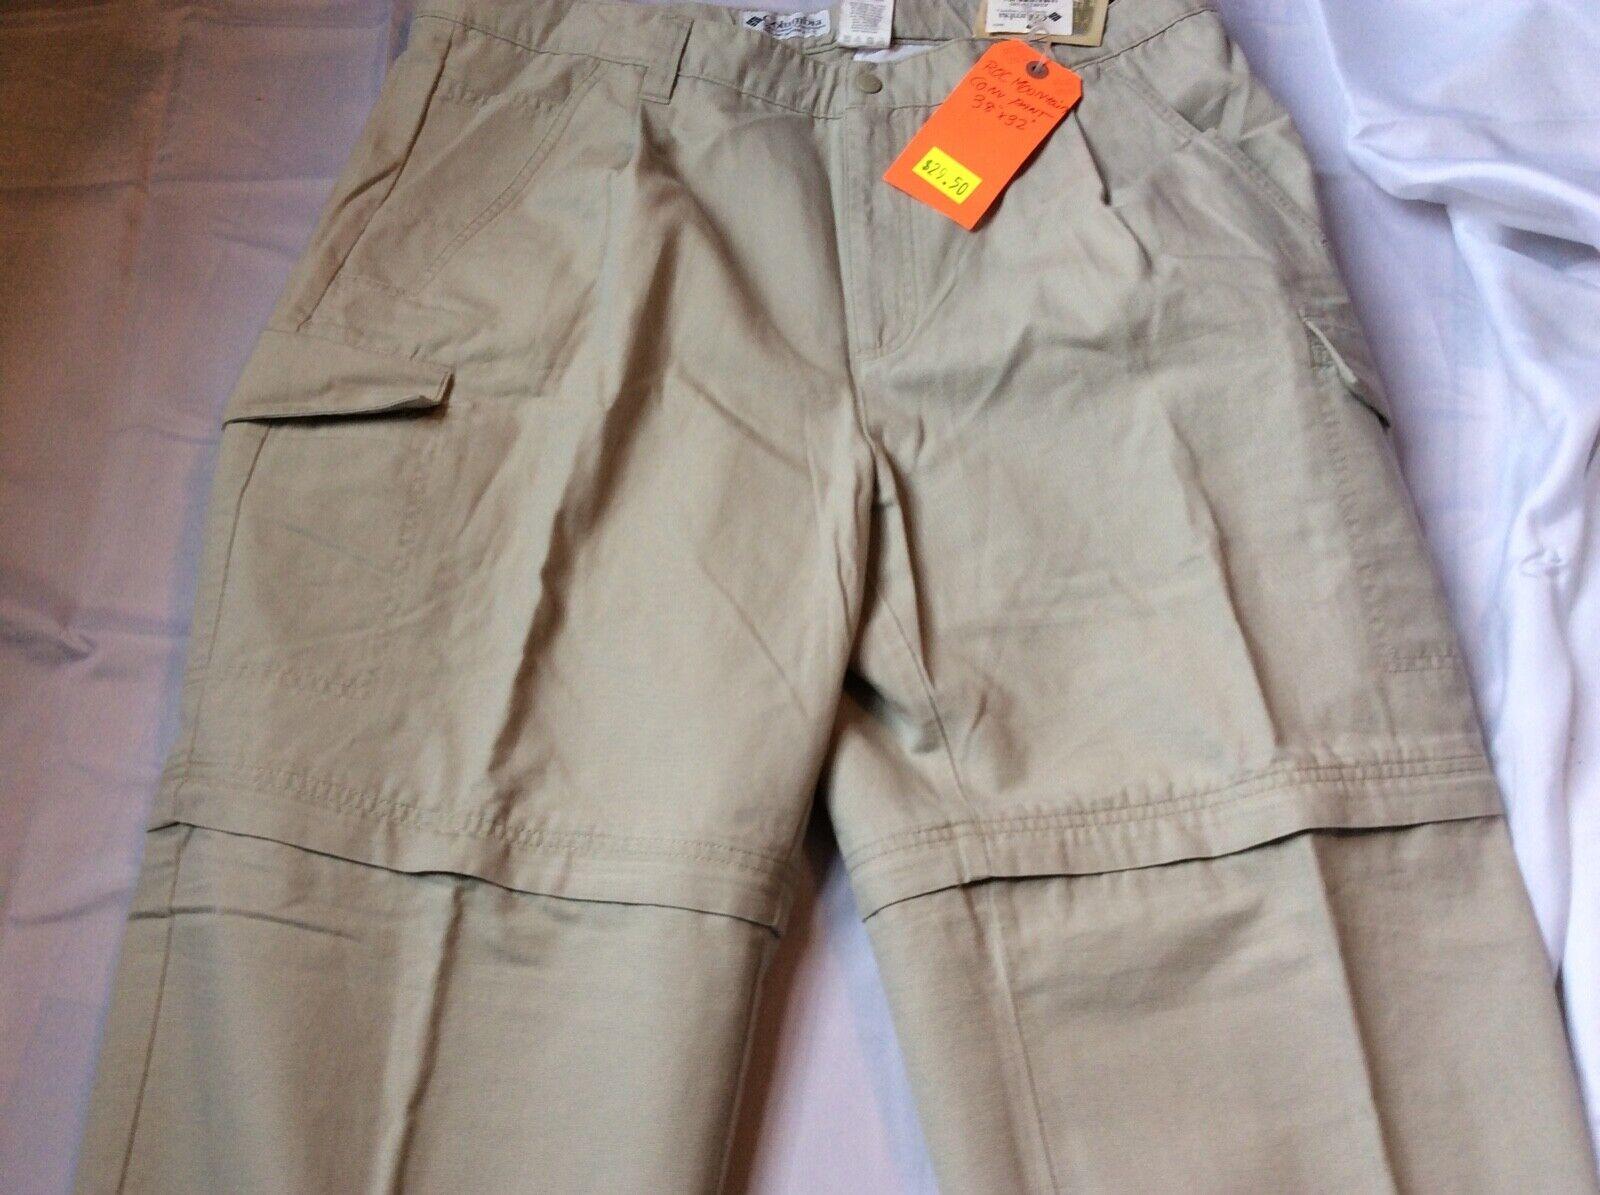 Columbia High Roc Congreenible Cotton Cargo Kahki Hiking Pants NWT